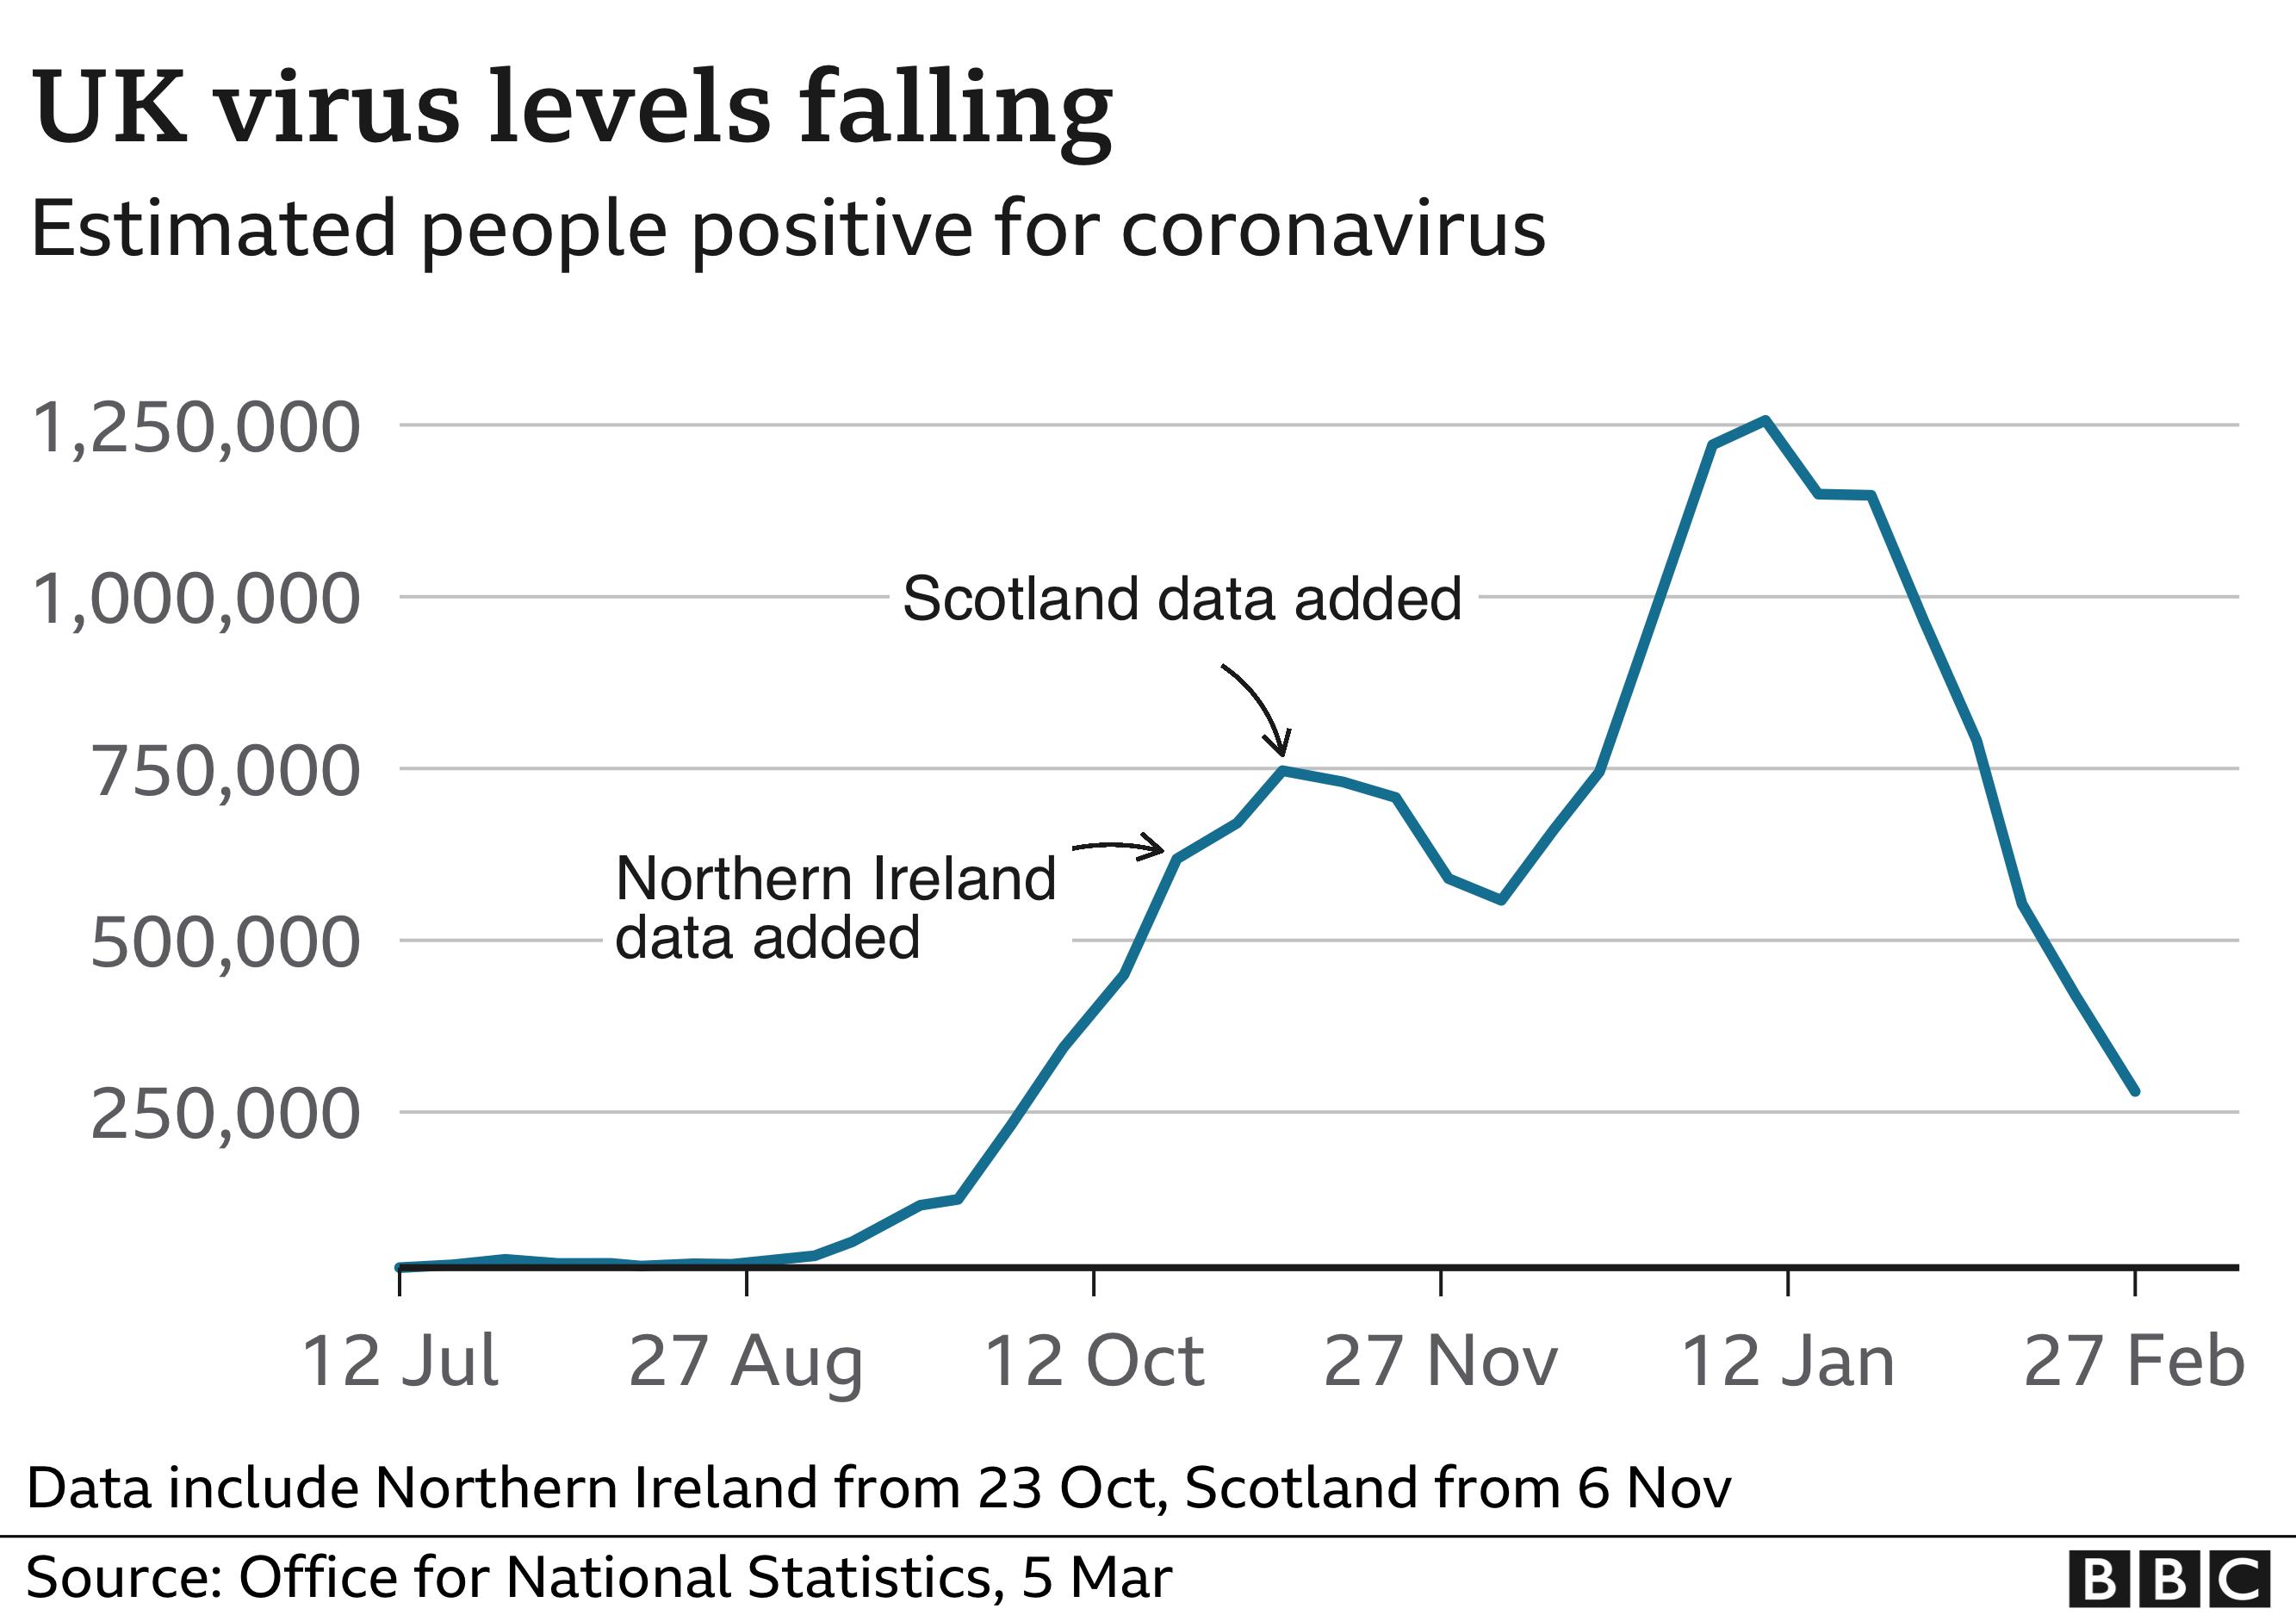 Graph showing virus levels falling